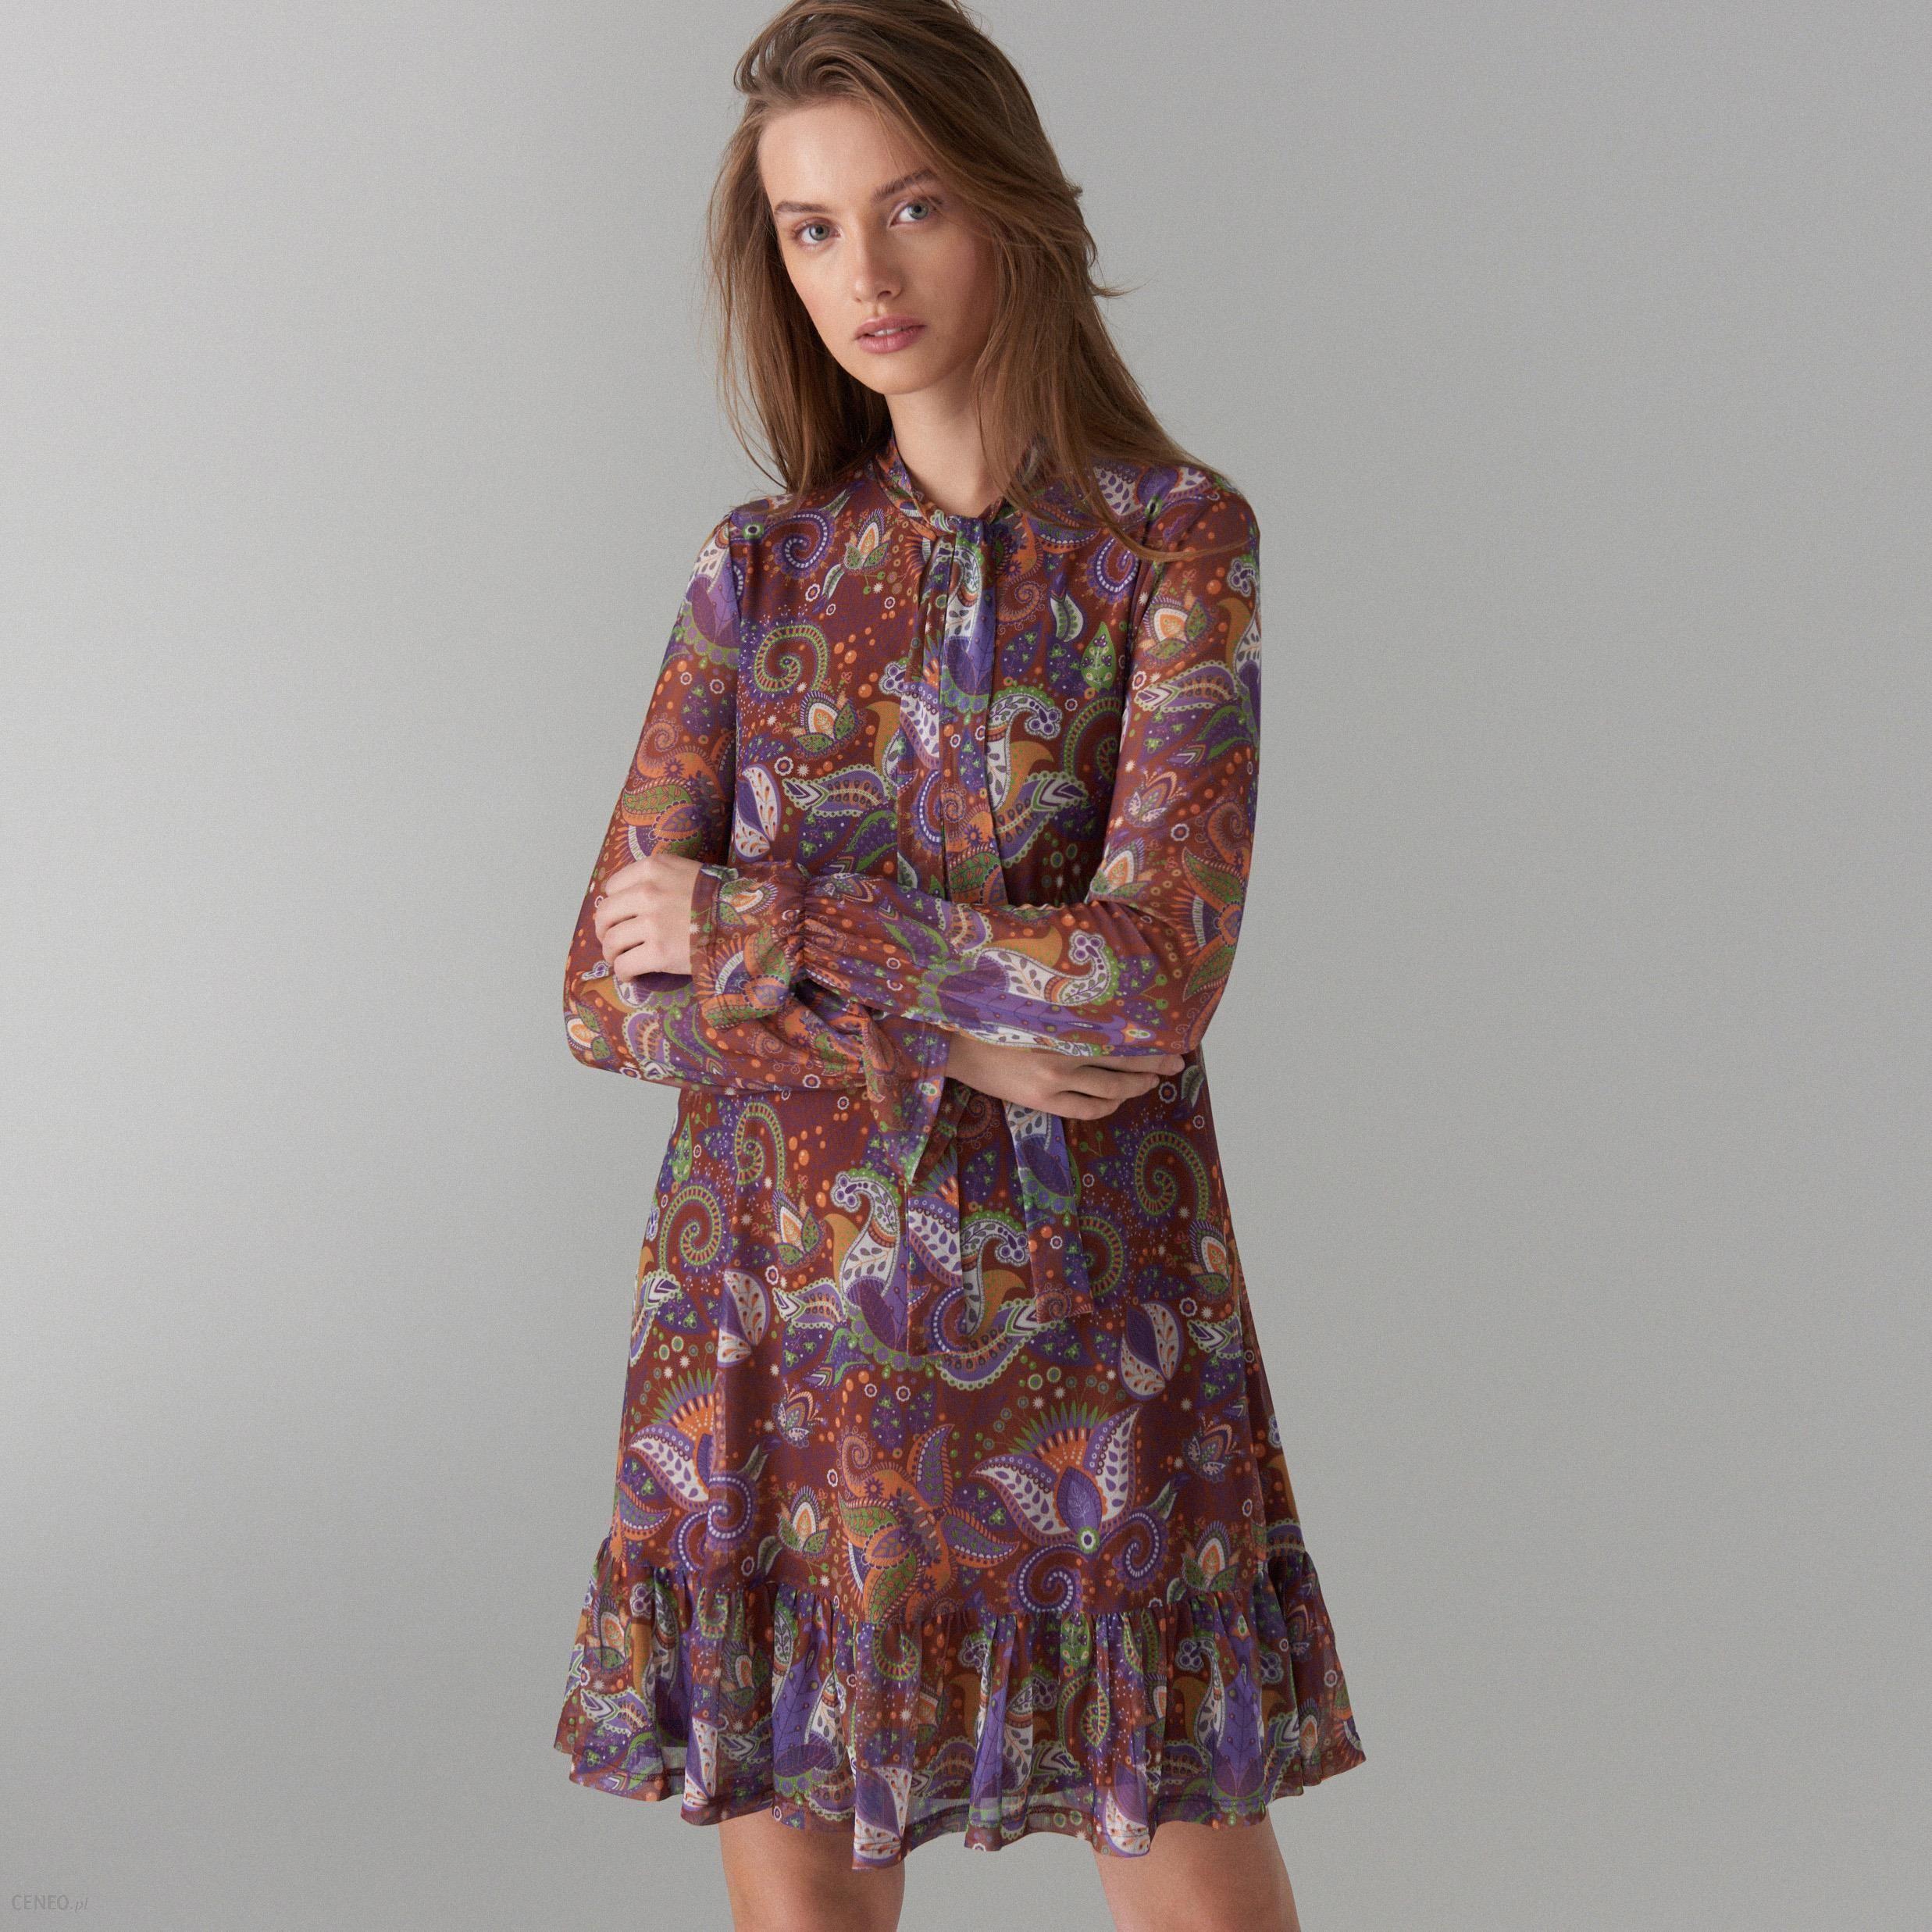 4e2e7b67 Mohito - Trapezowa sukienka we wzory - Brązowy - Ceny i opinie - Ceneo.pl